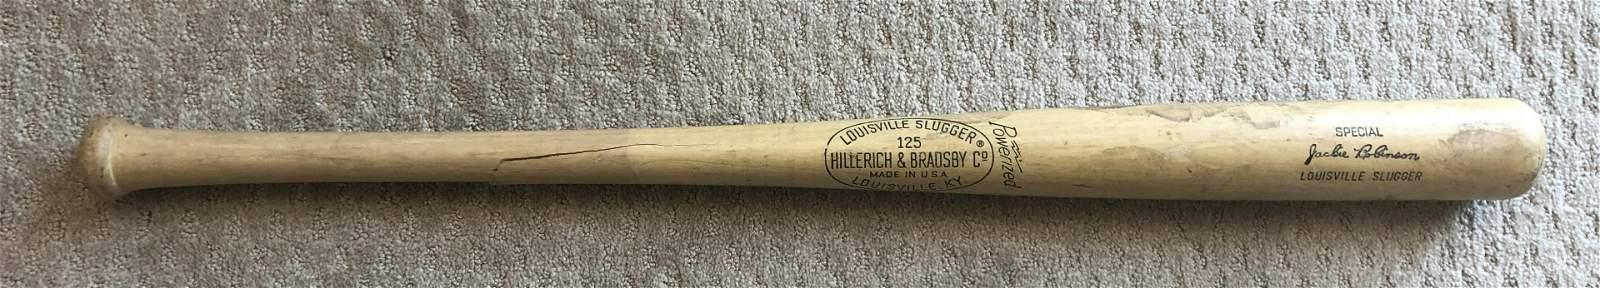 Jackie Robinson Bat - Louisville Slugger